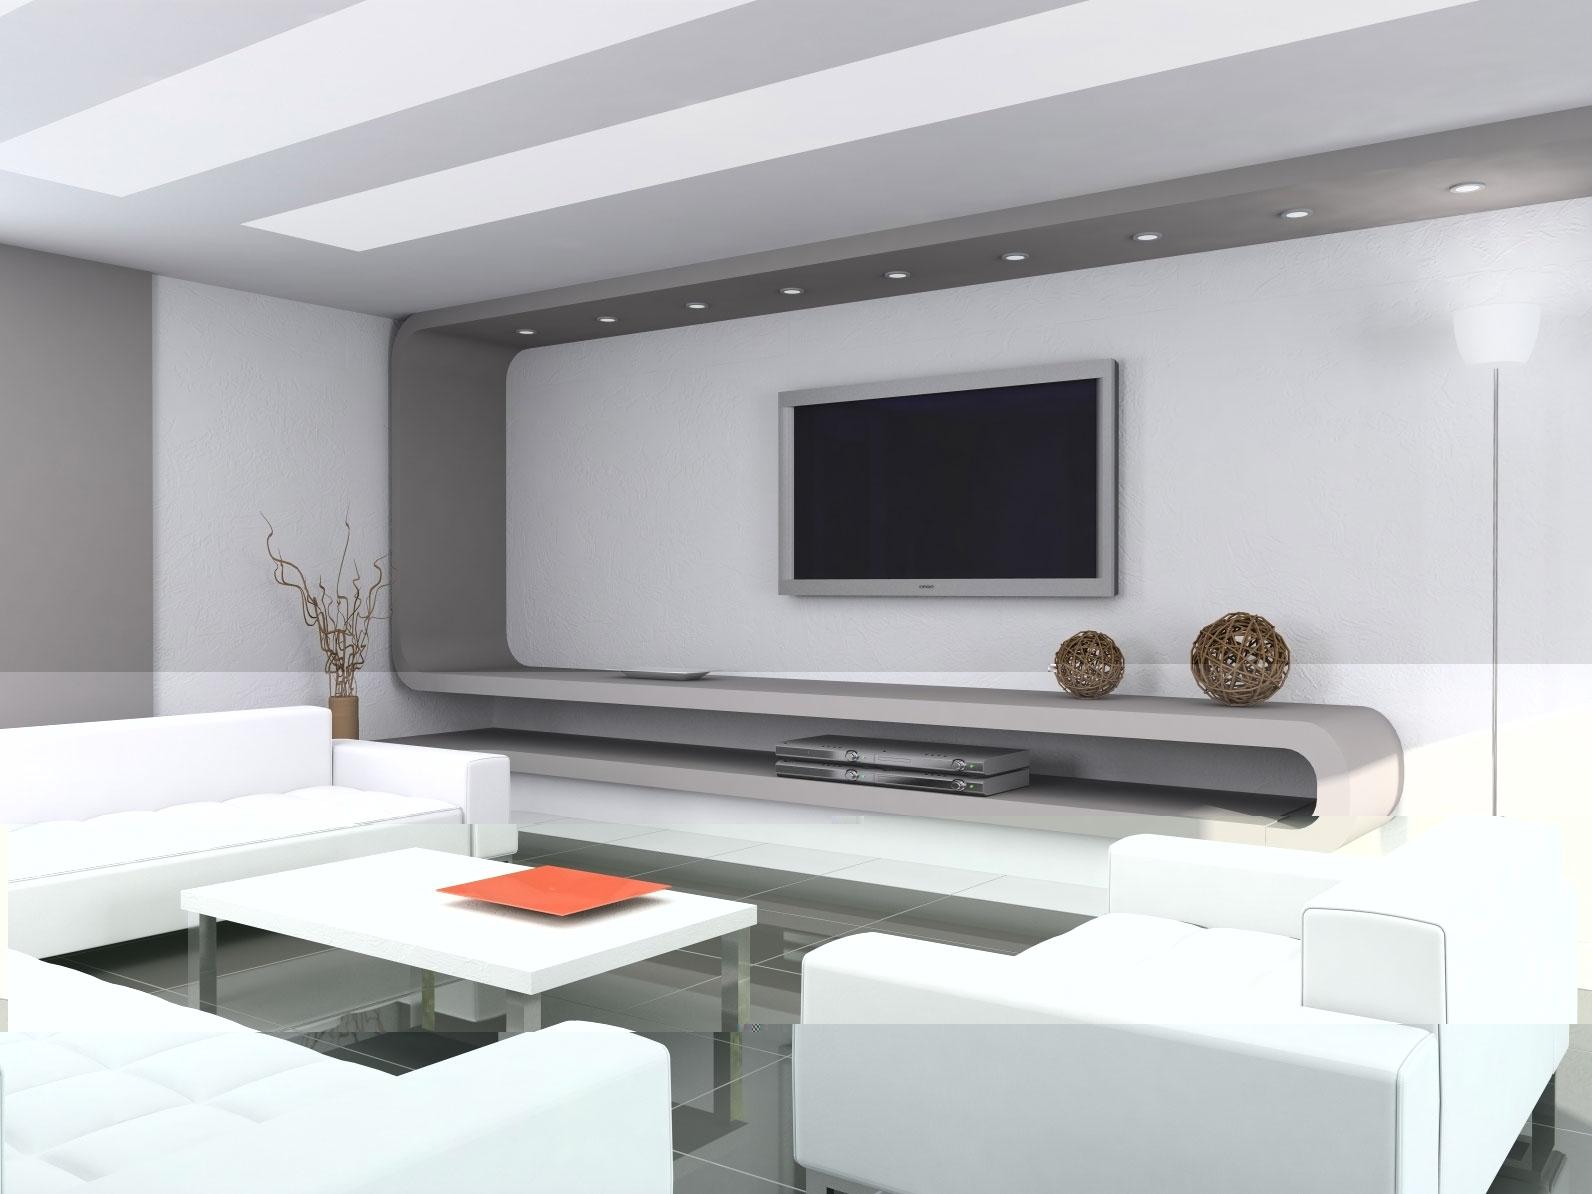 Kumpulan desain rumah minimalis modern desain interior for Design interior minimalis modern